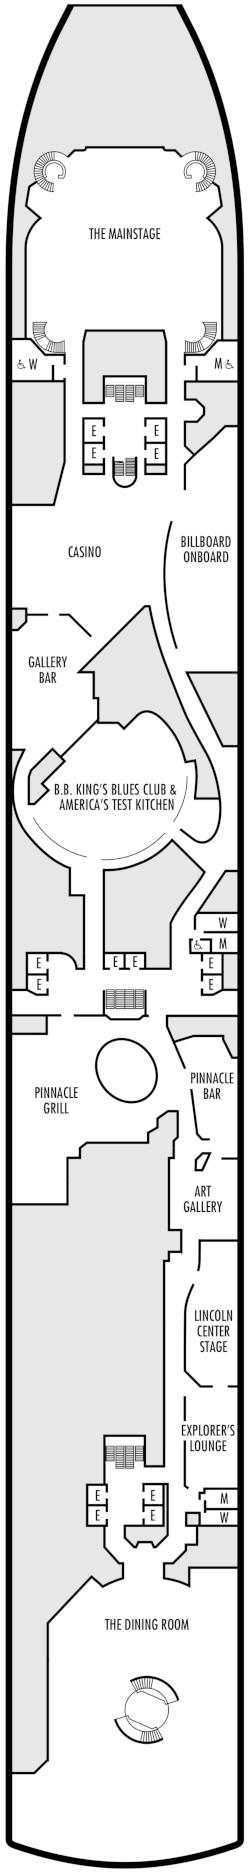 Zuiderdam Lower Promenade Deck Deck Plan